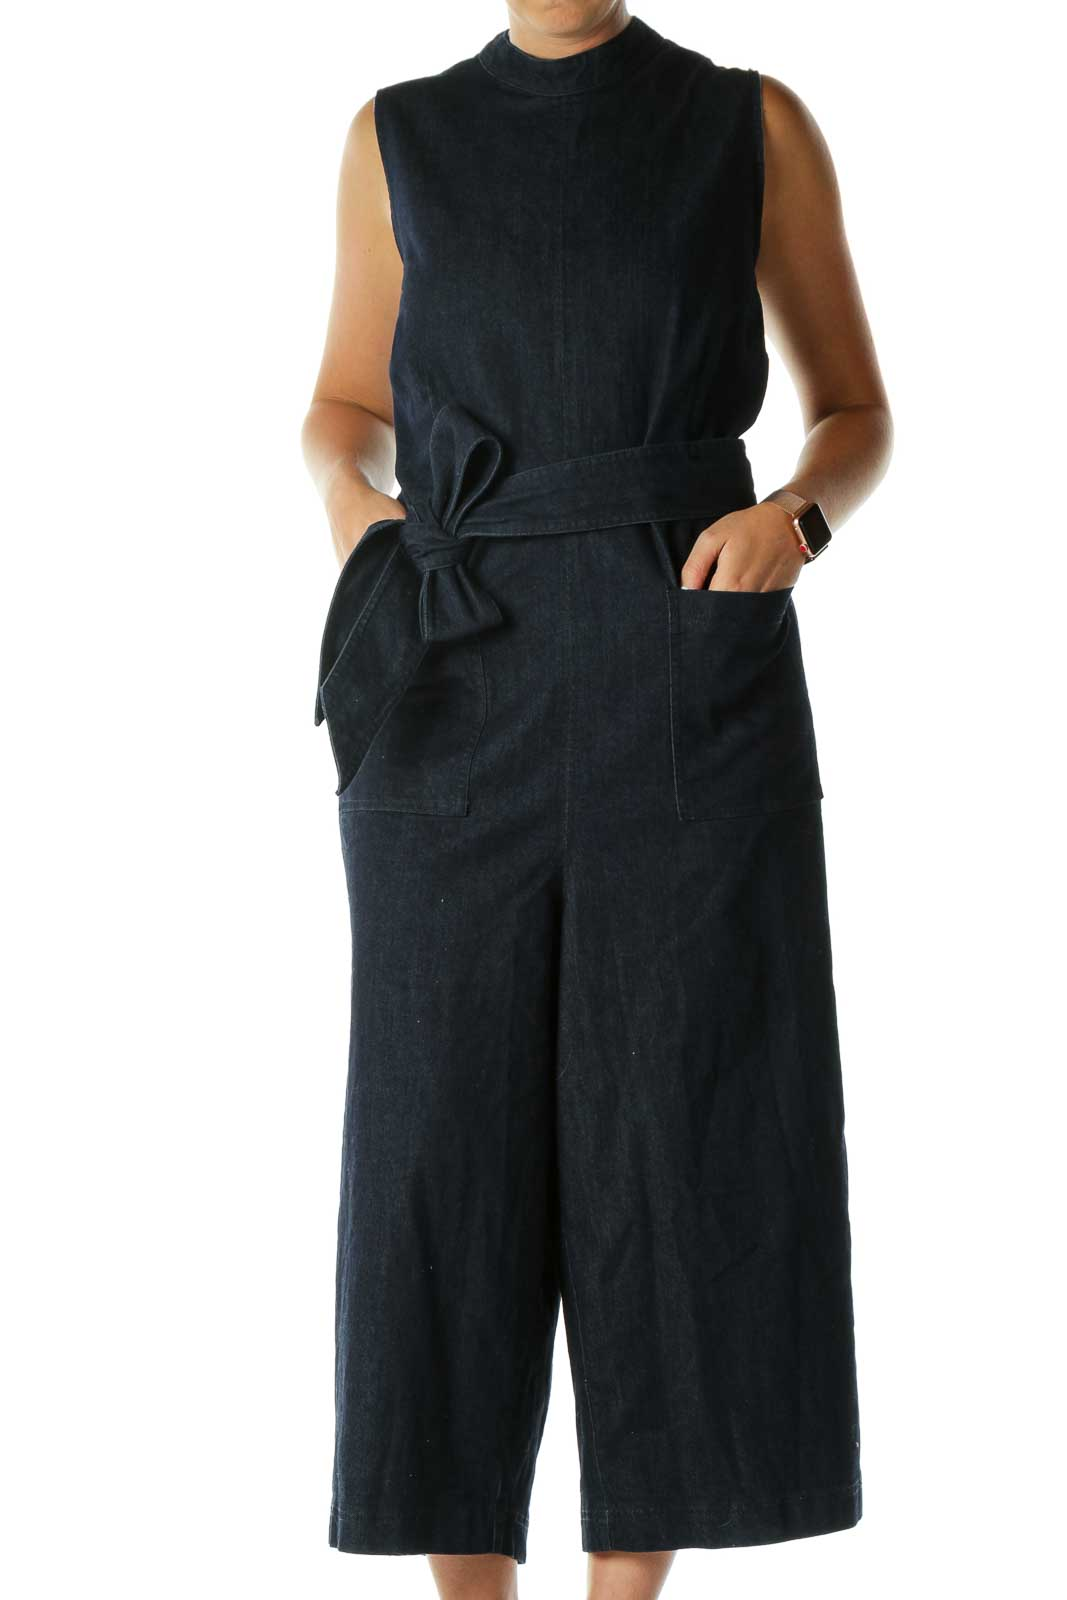 Blue Denim Sleeveless Jumpsuit Front